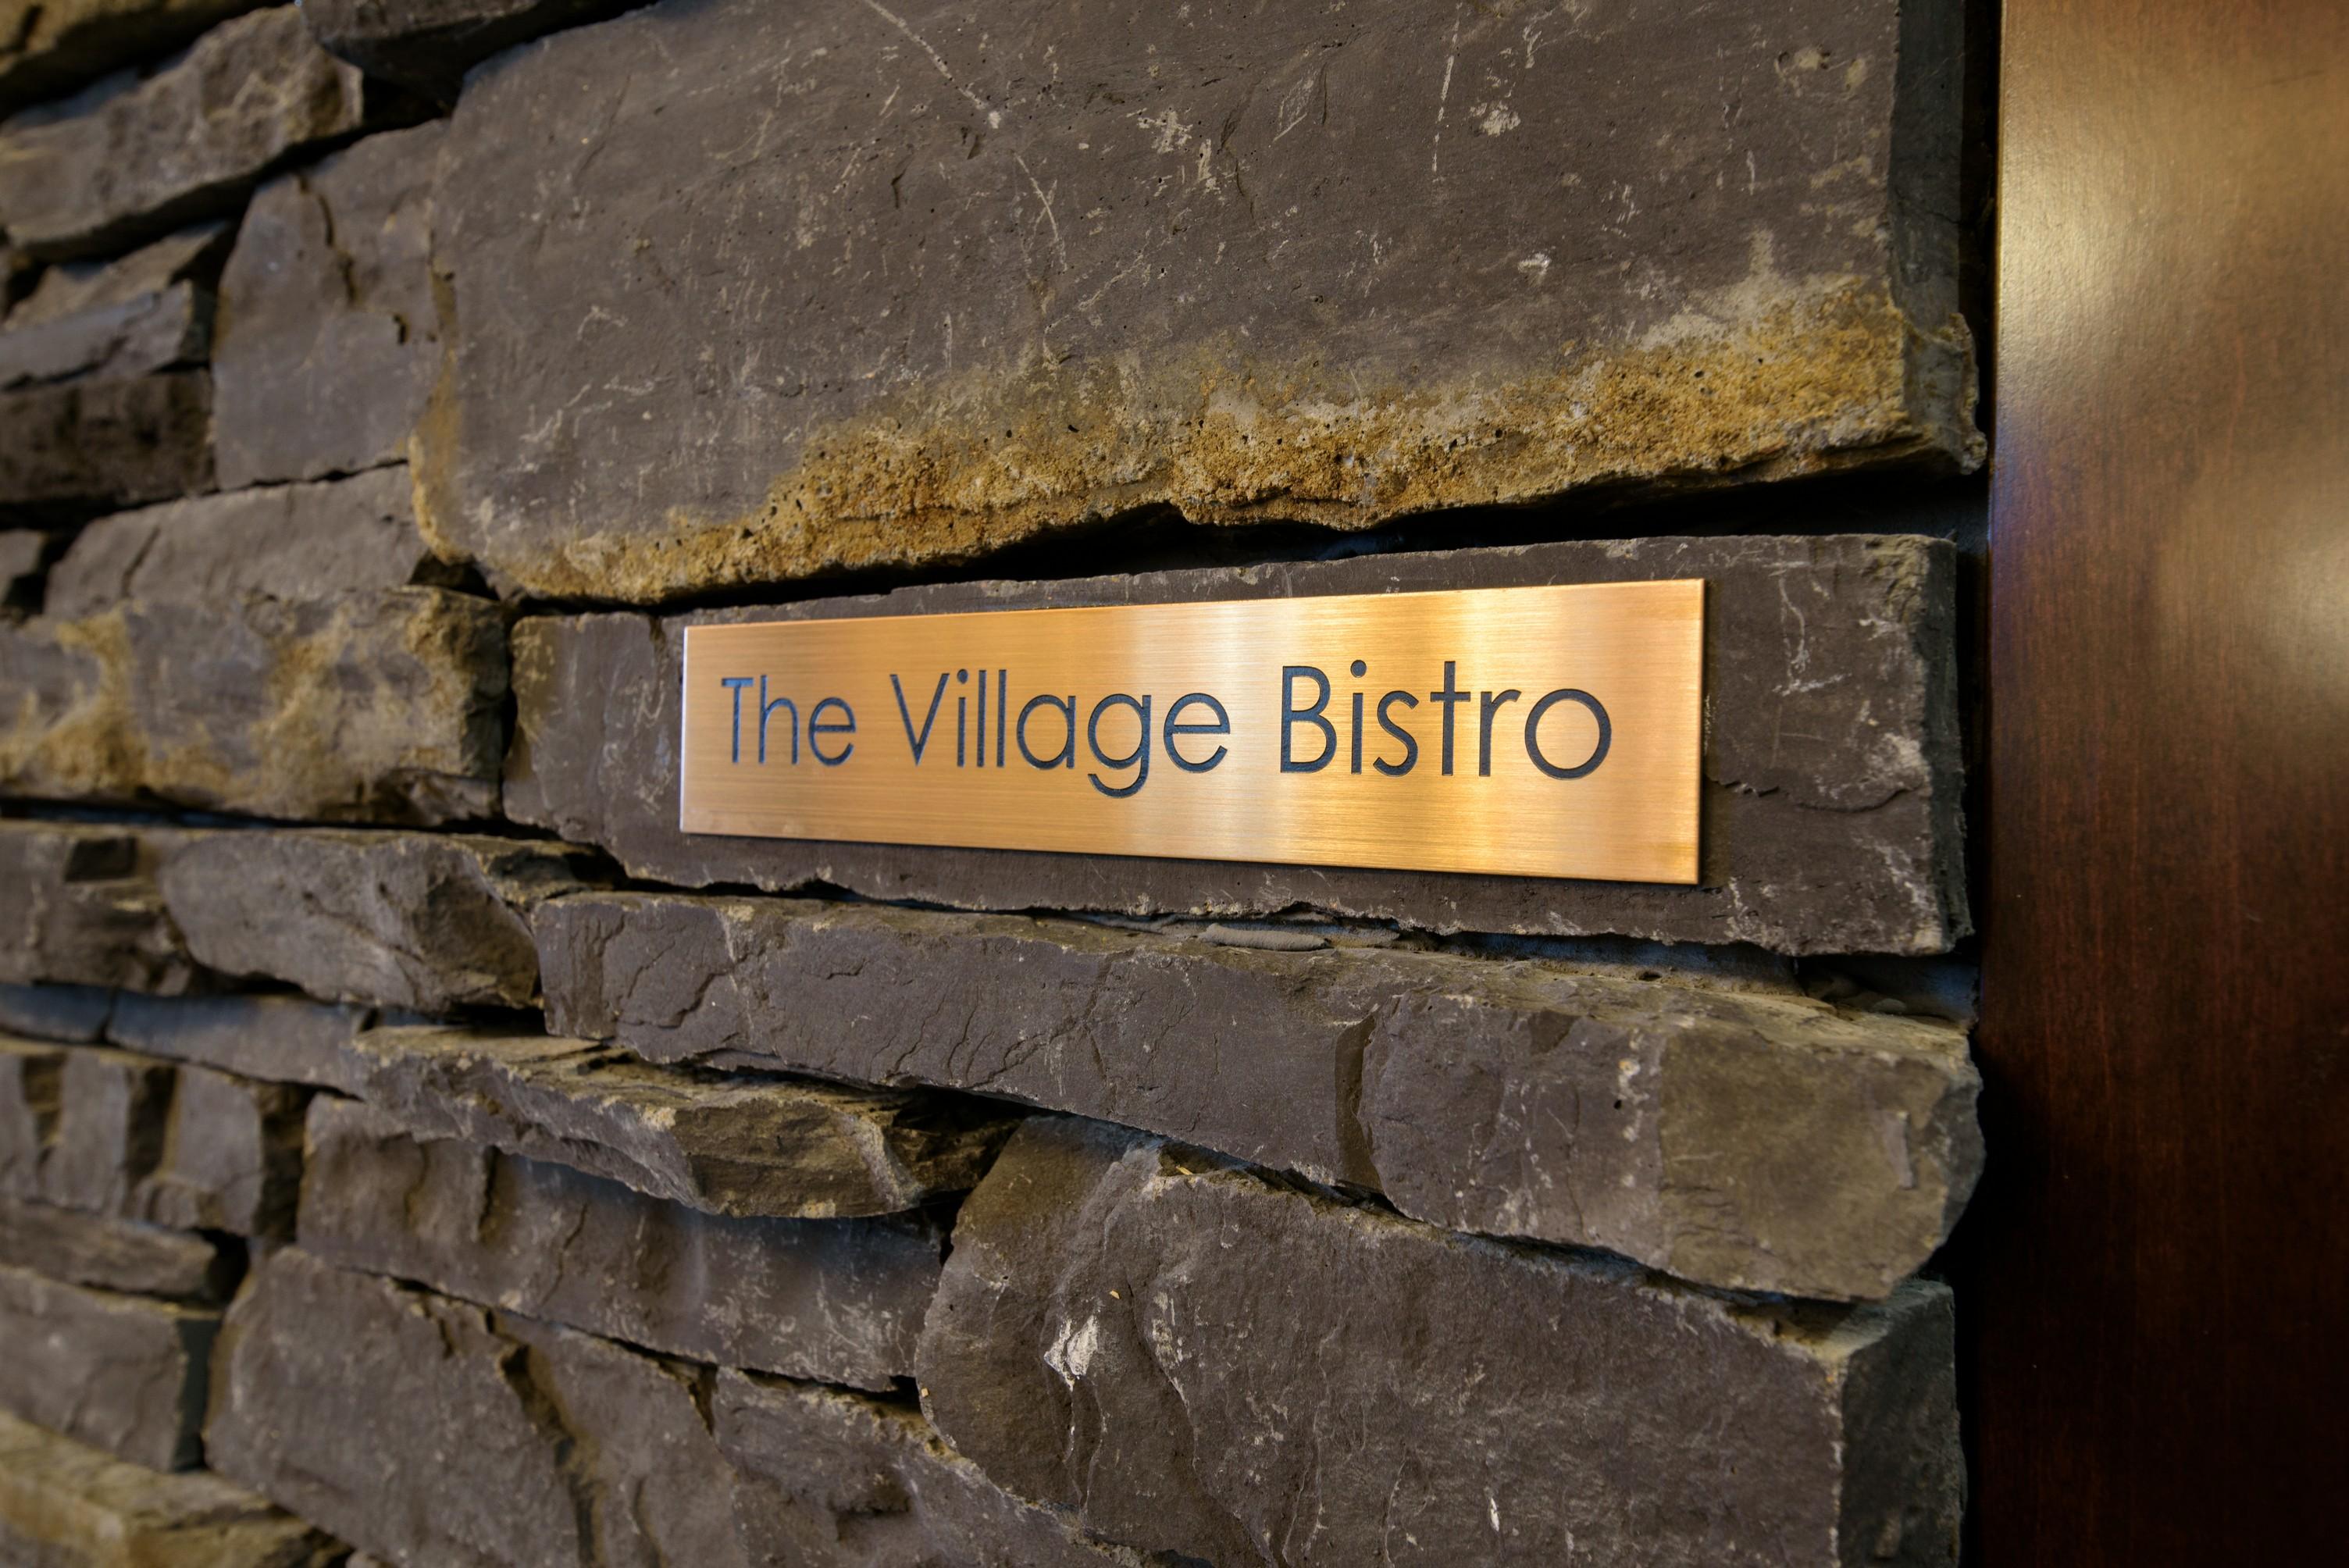 The Village Bistro Saskatoon